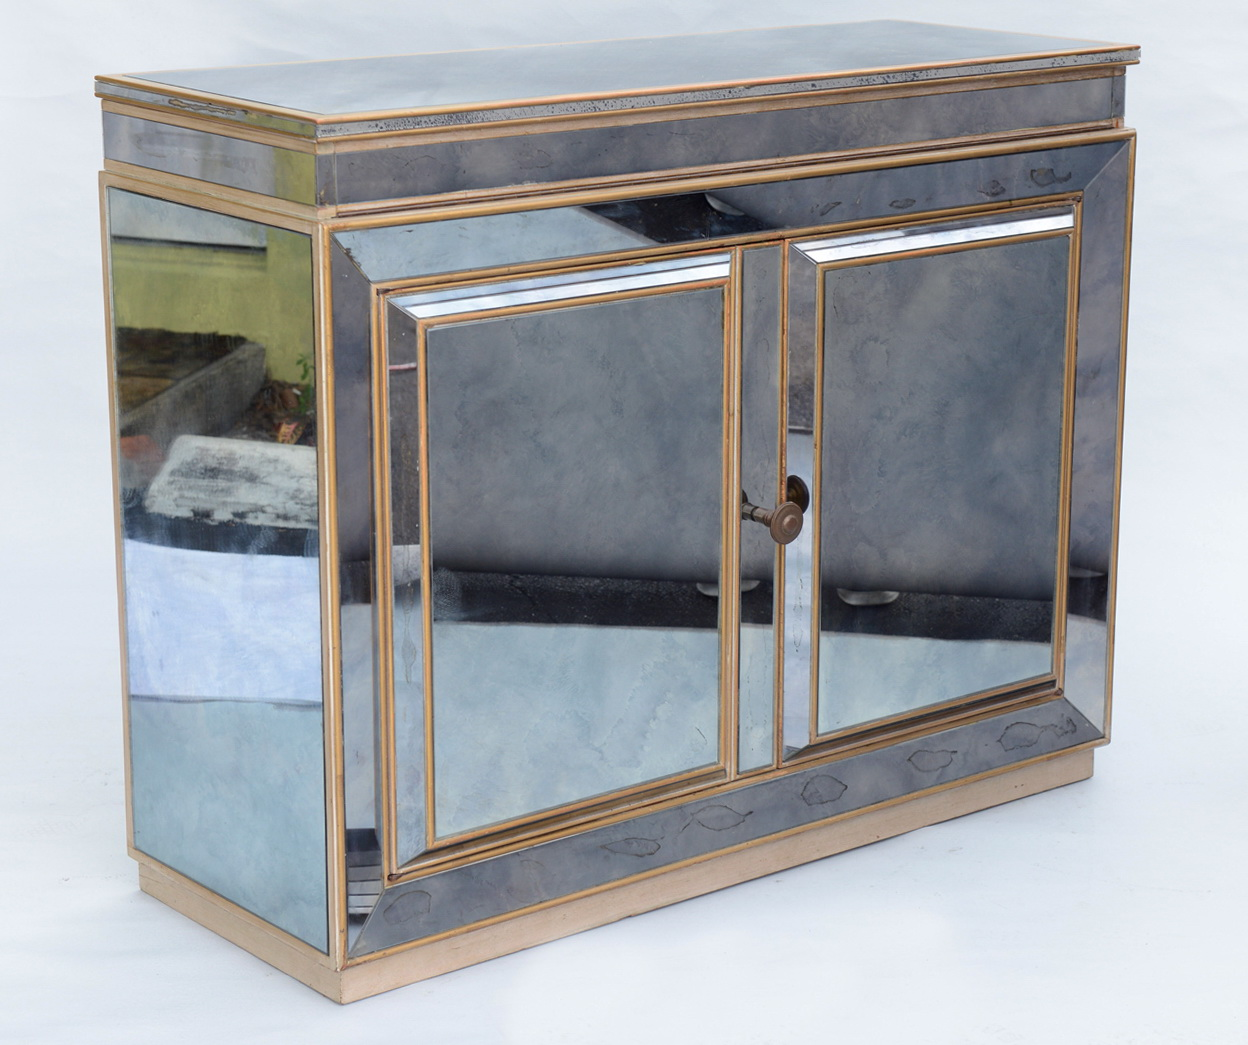 Mirrored Art Deco Bar Cabinet